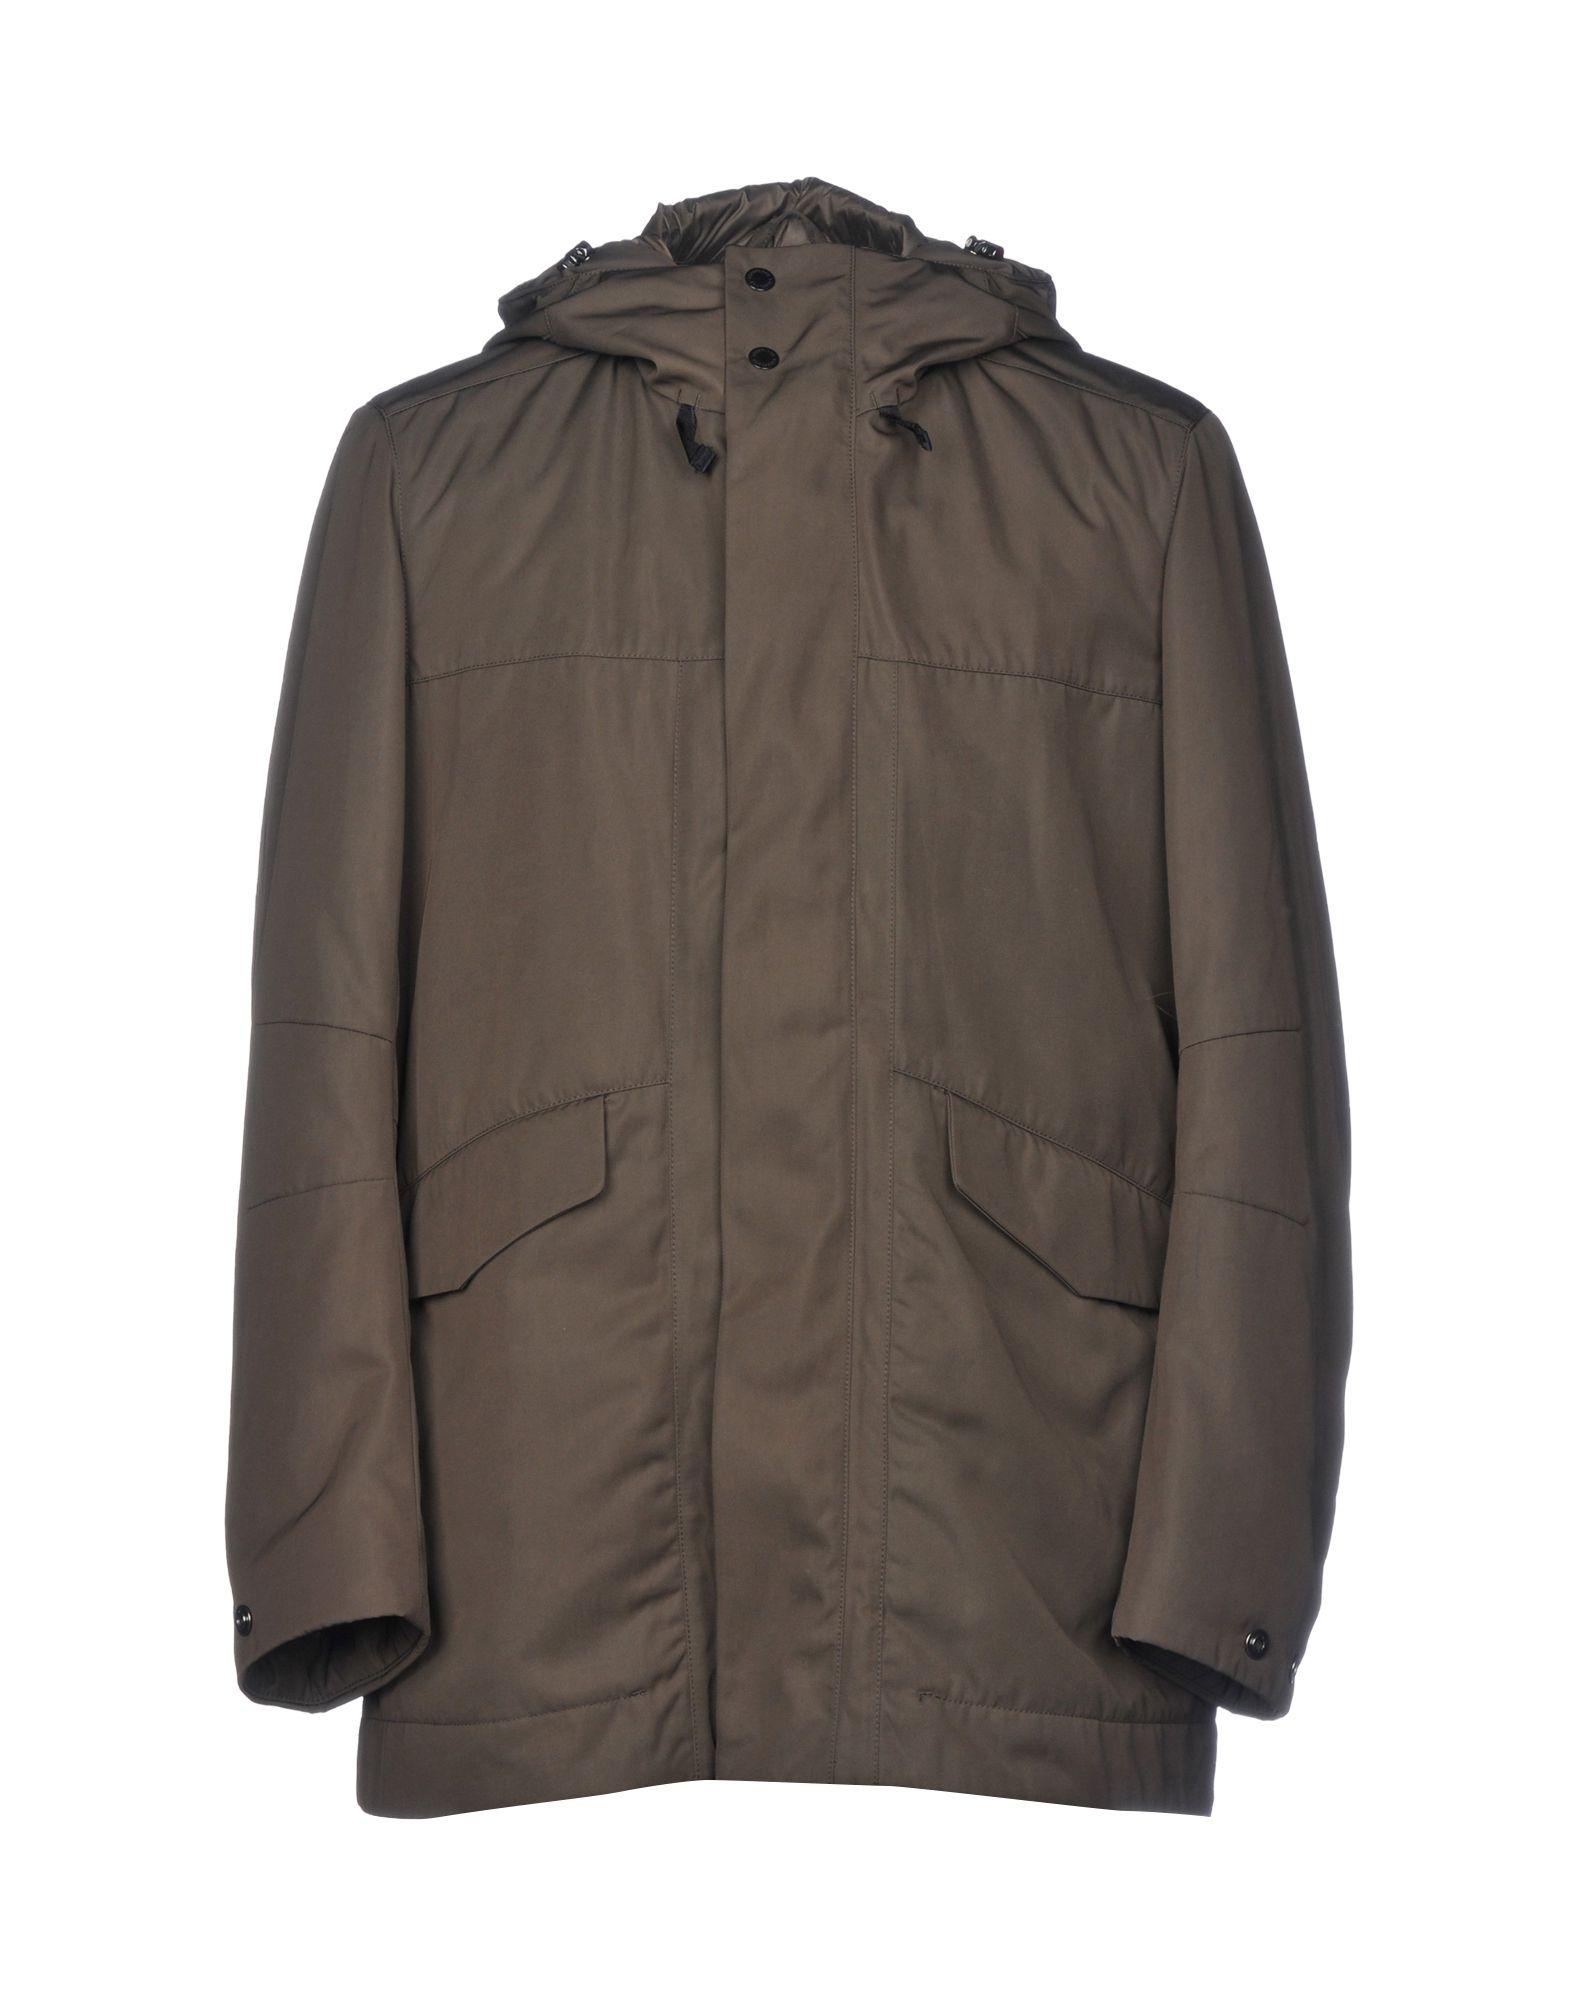 ESEMPLARE Jacket in Khaki